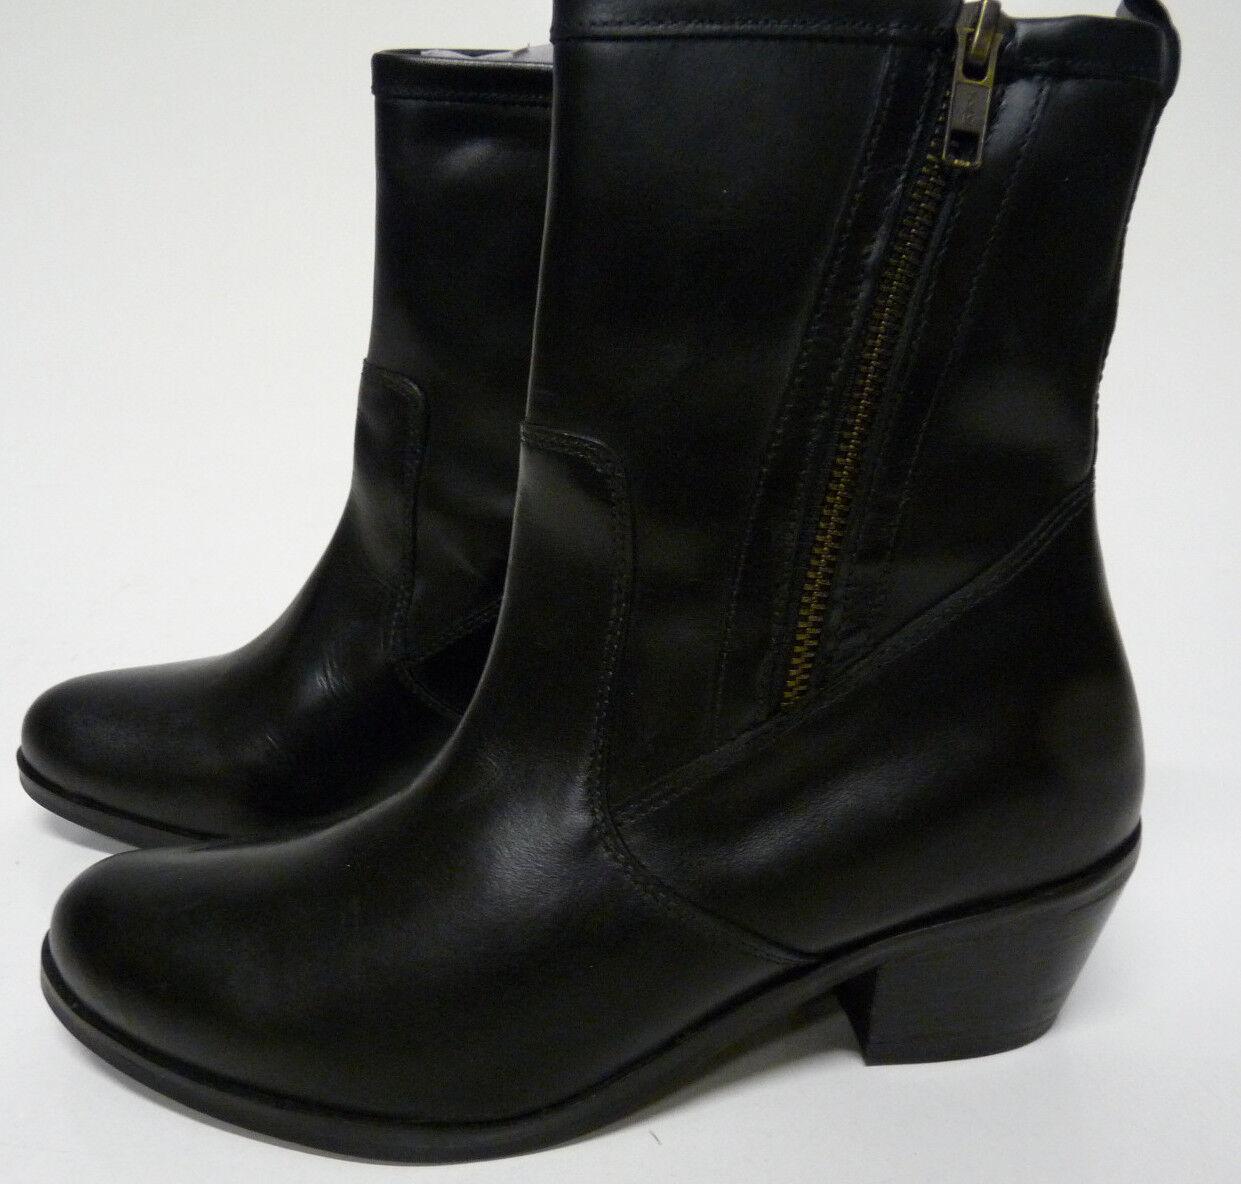 Mia 'Jive' Women's Black Leather Side Zipper Fashion Ankle Boots